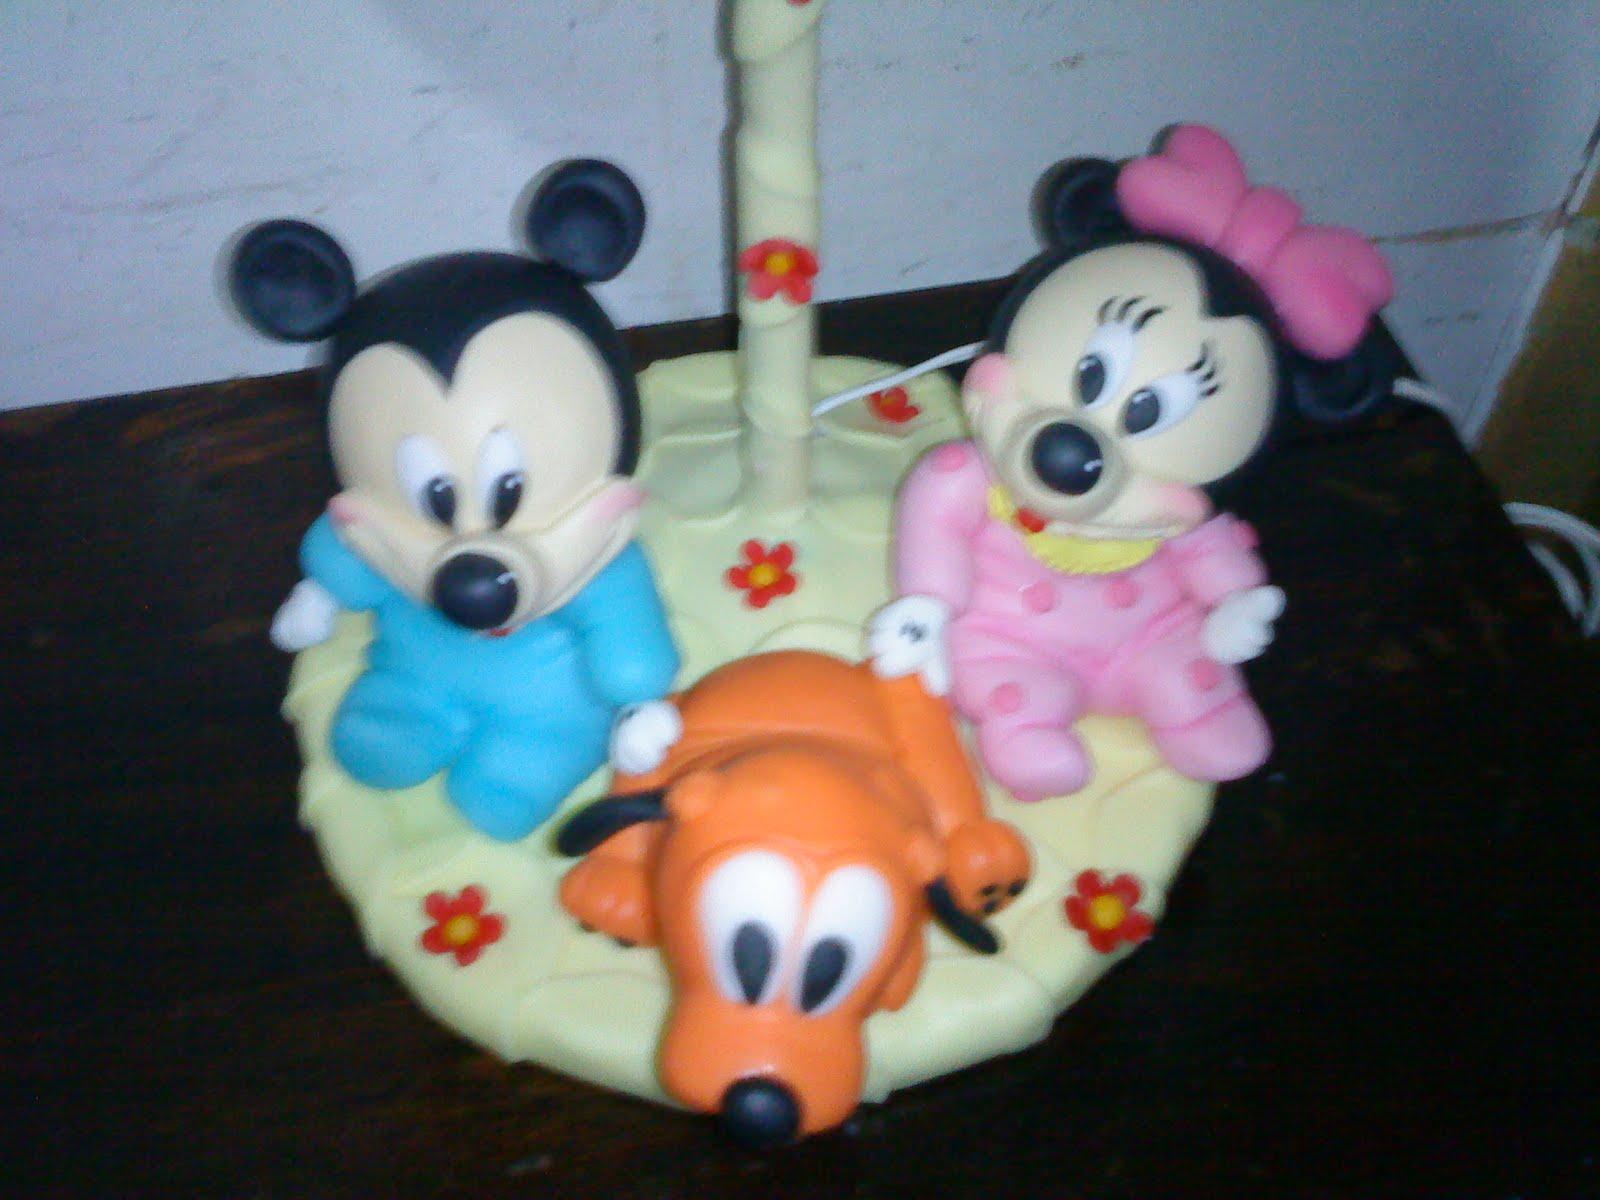 Mickey Mouse bebés en porcelana fria - Imagui